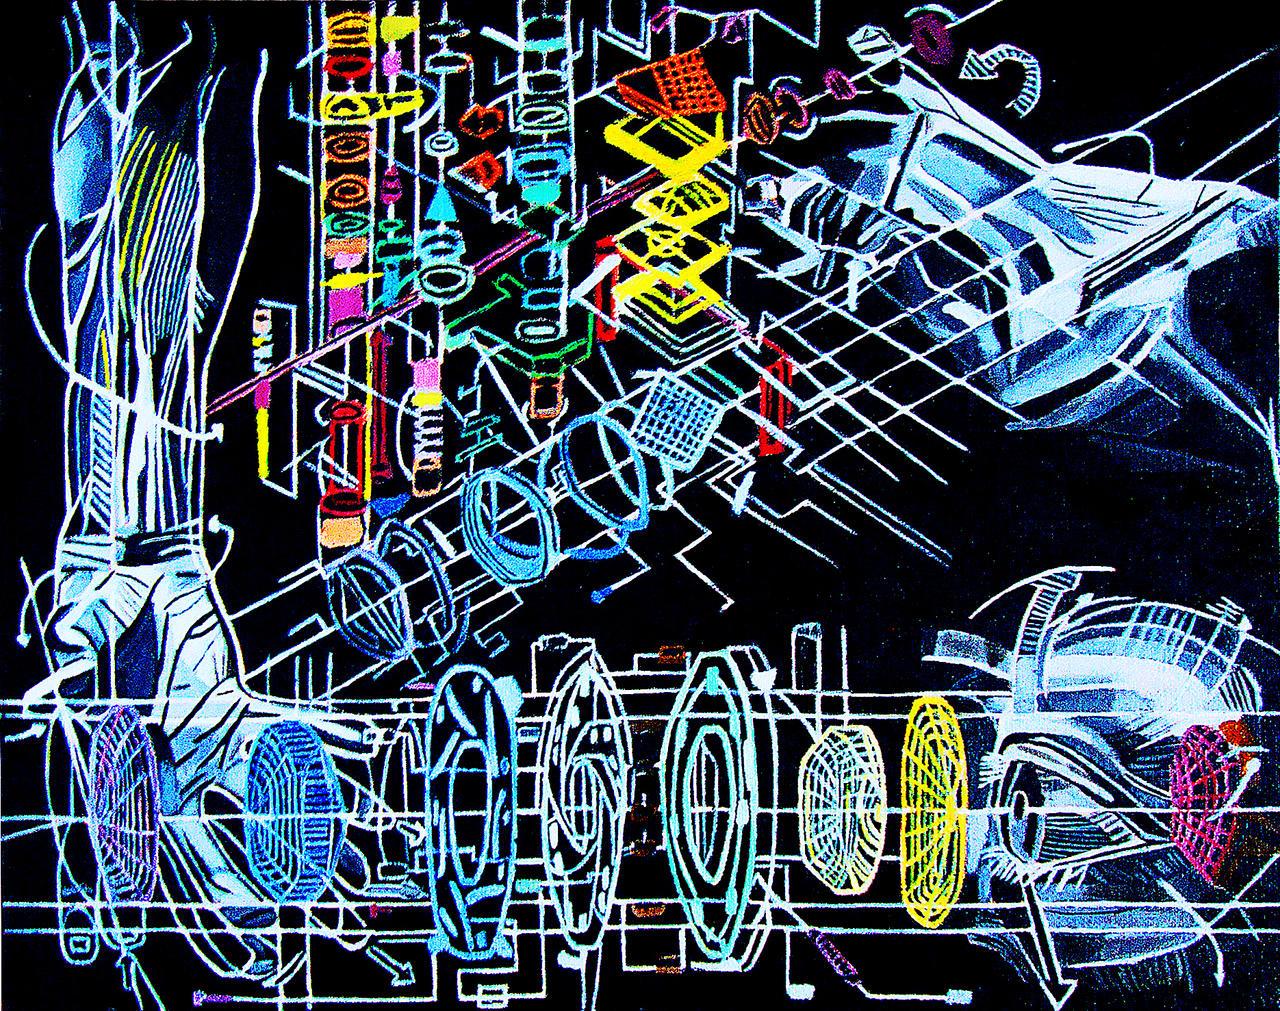 Regenerative Mechanisms - Atsushi Koyama